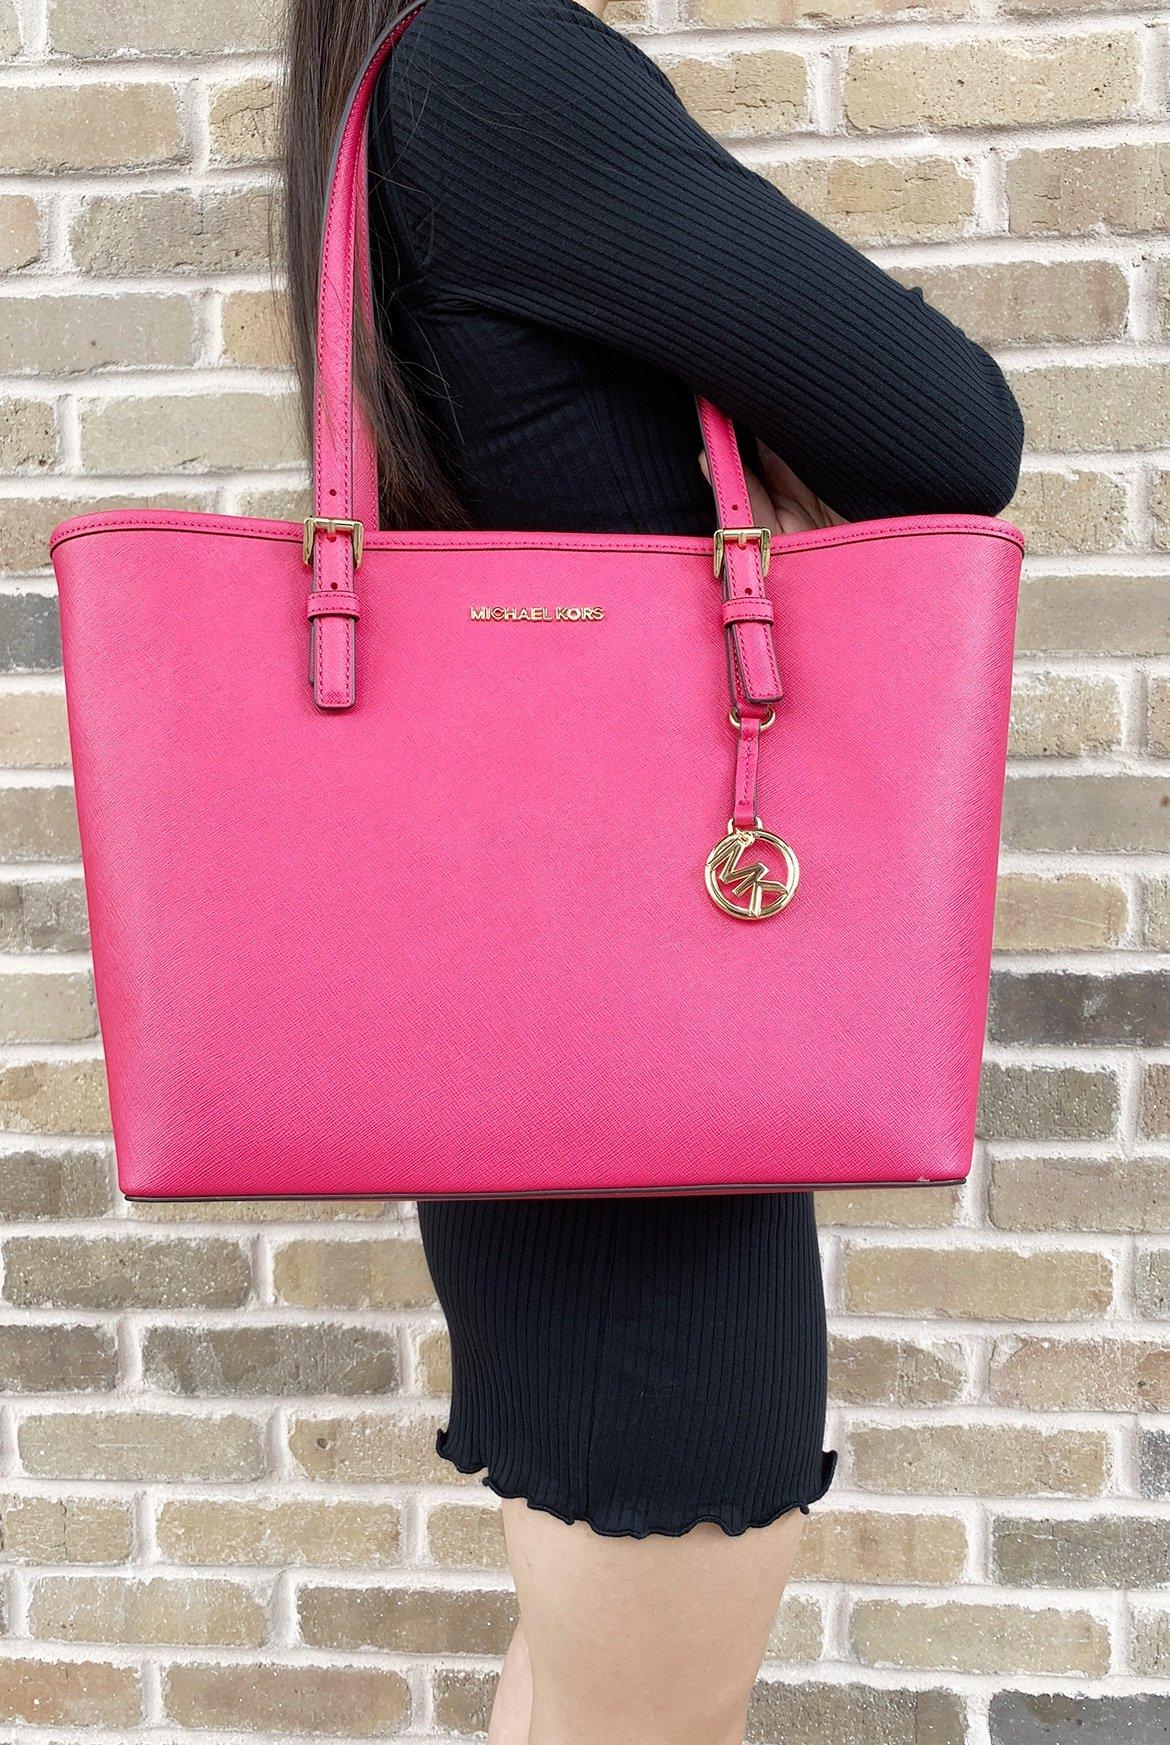 36e739293e Michael Kors Jet Set Travel Medium Carryall Tote Saffiano Leather Pink